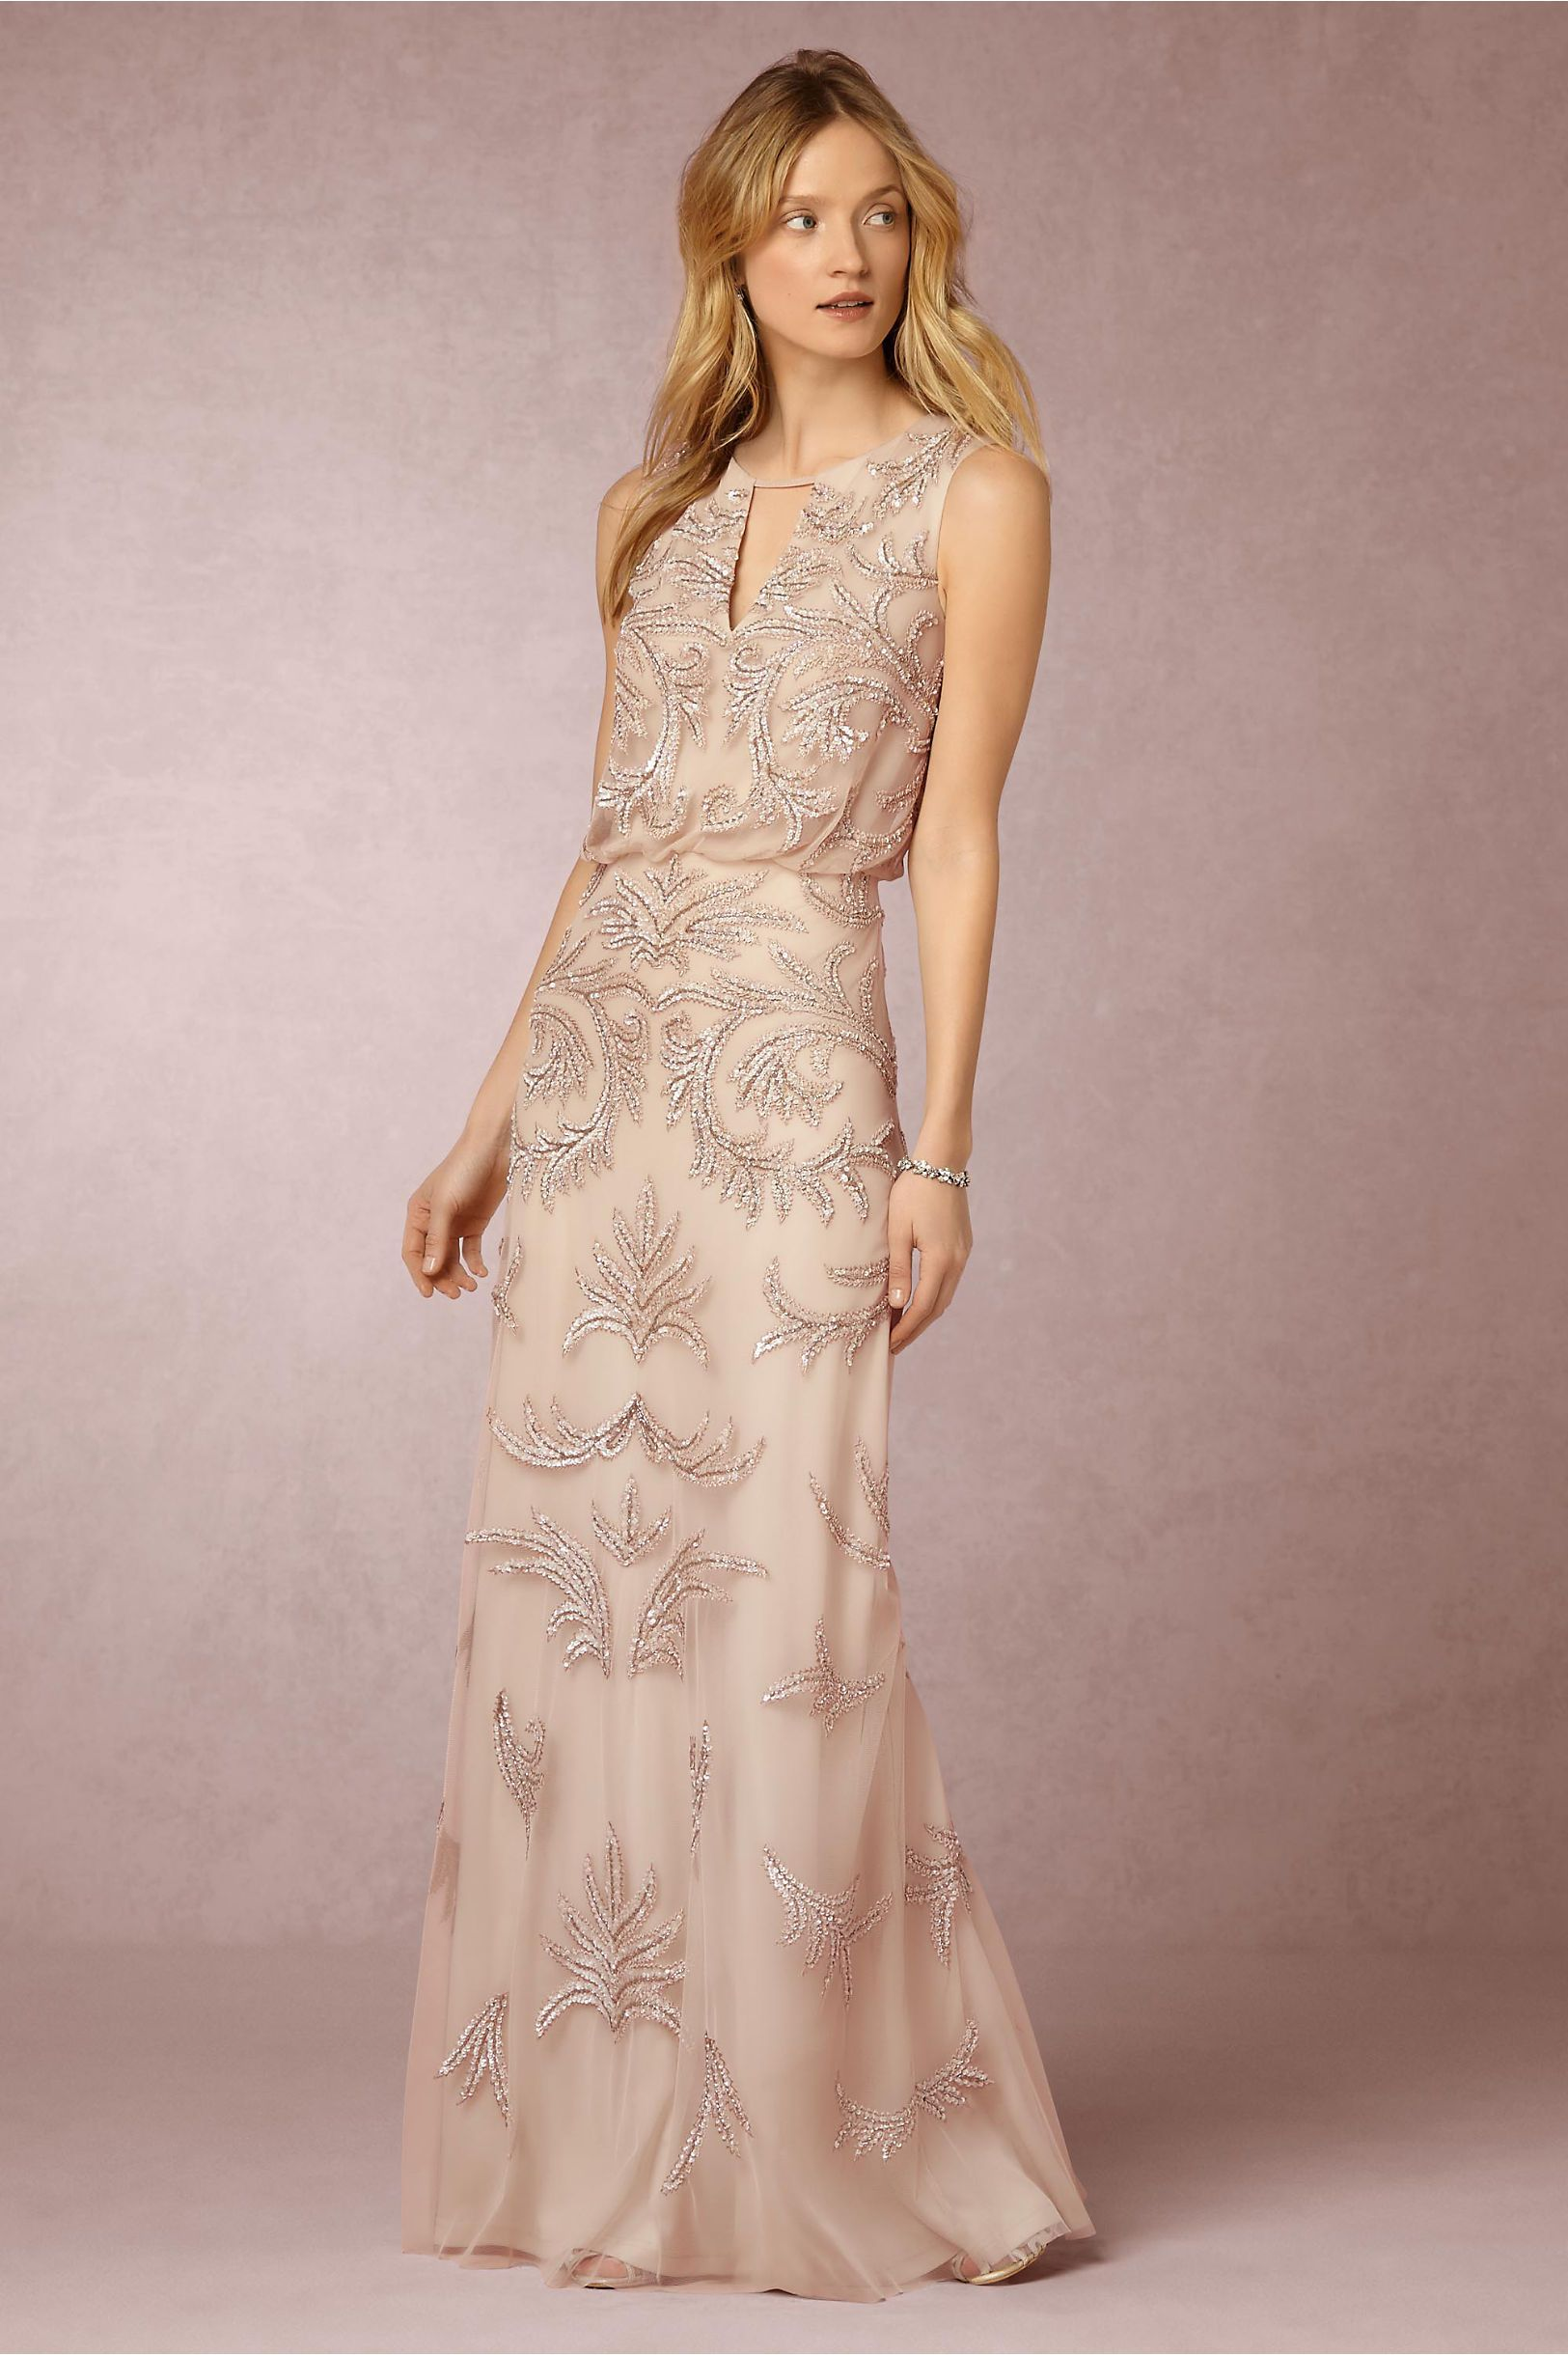 BHLDN\'s Aidan Mattox Hazel Dress in Champagne | Rehearsal dress ...